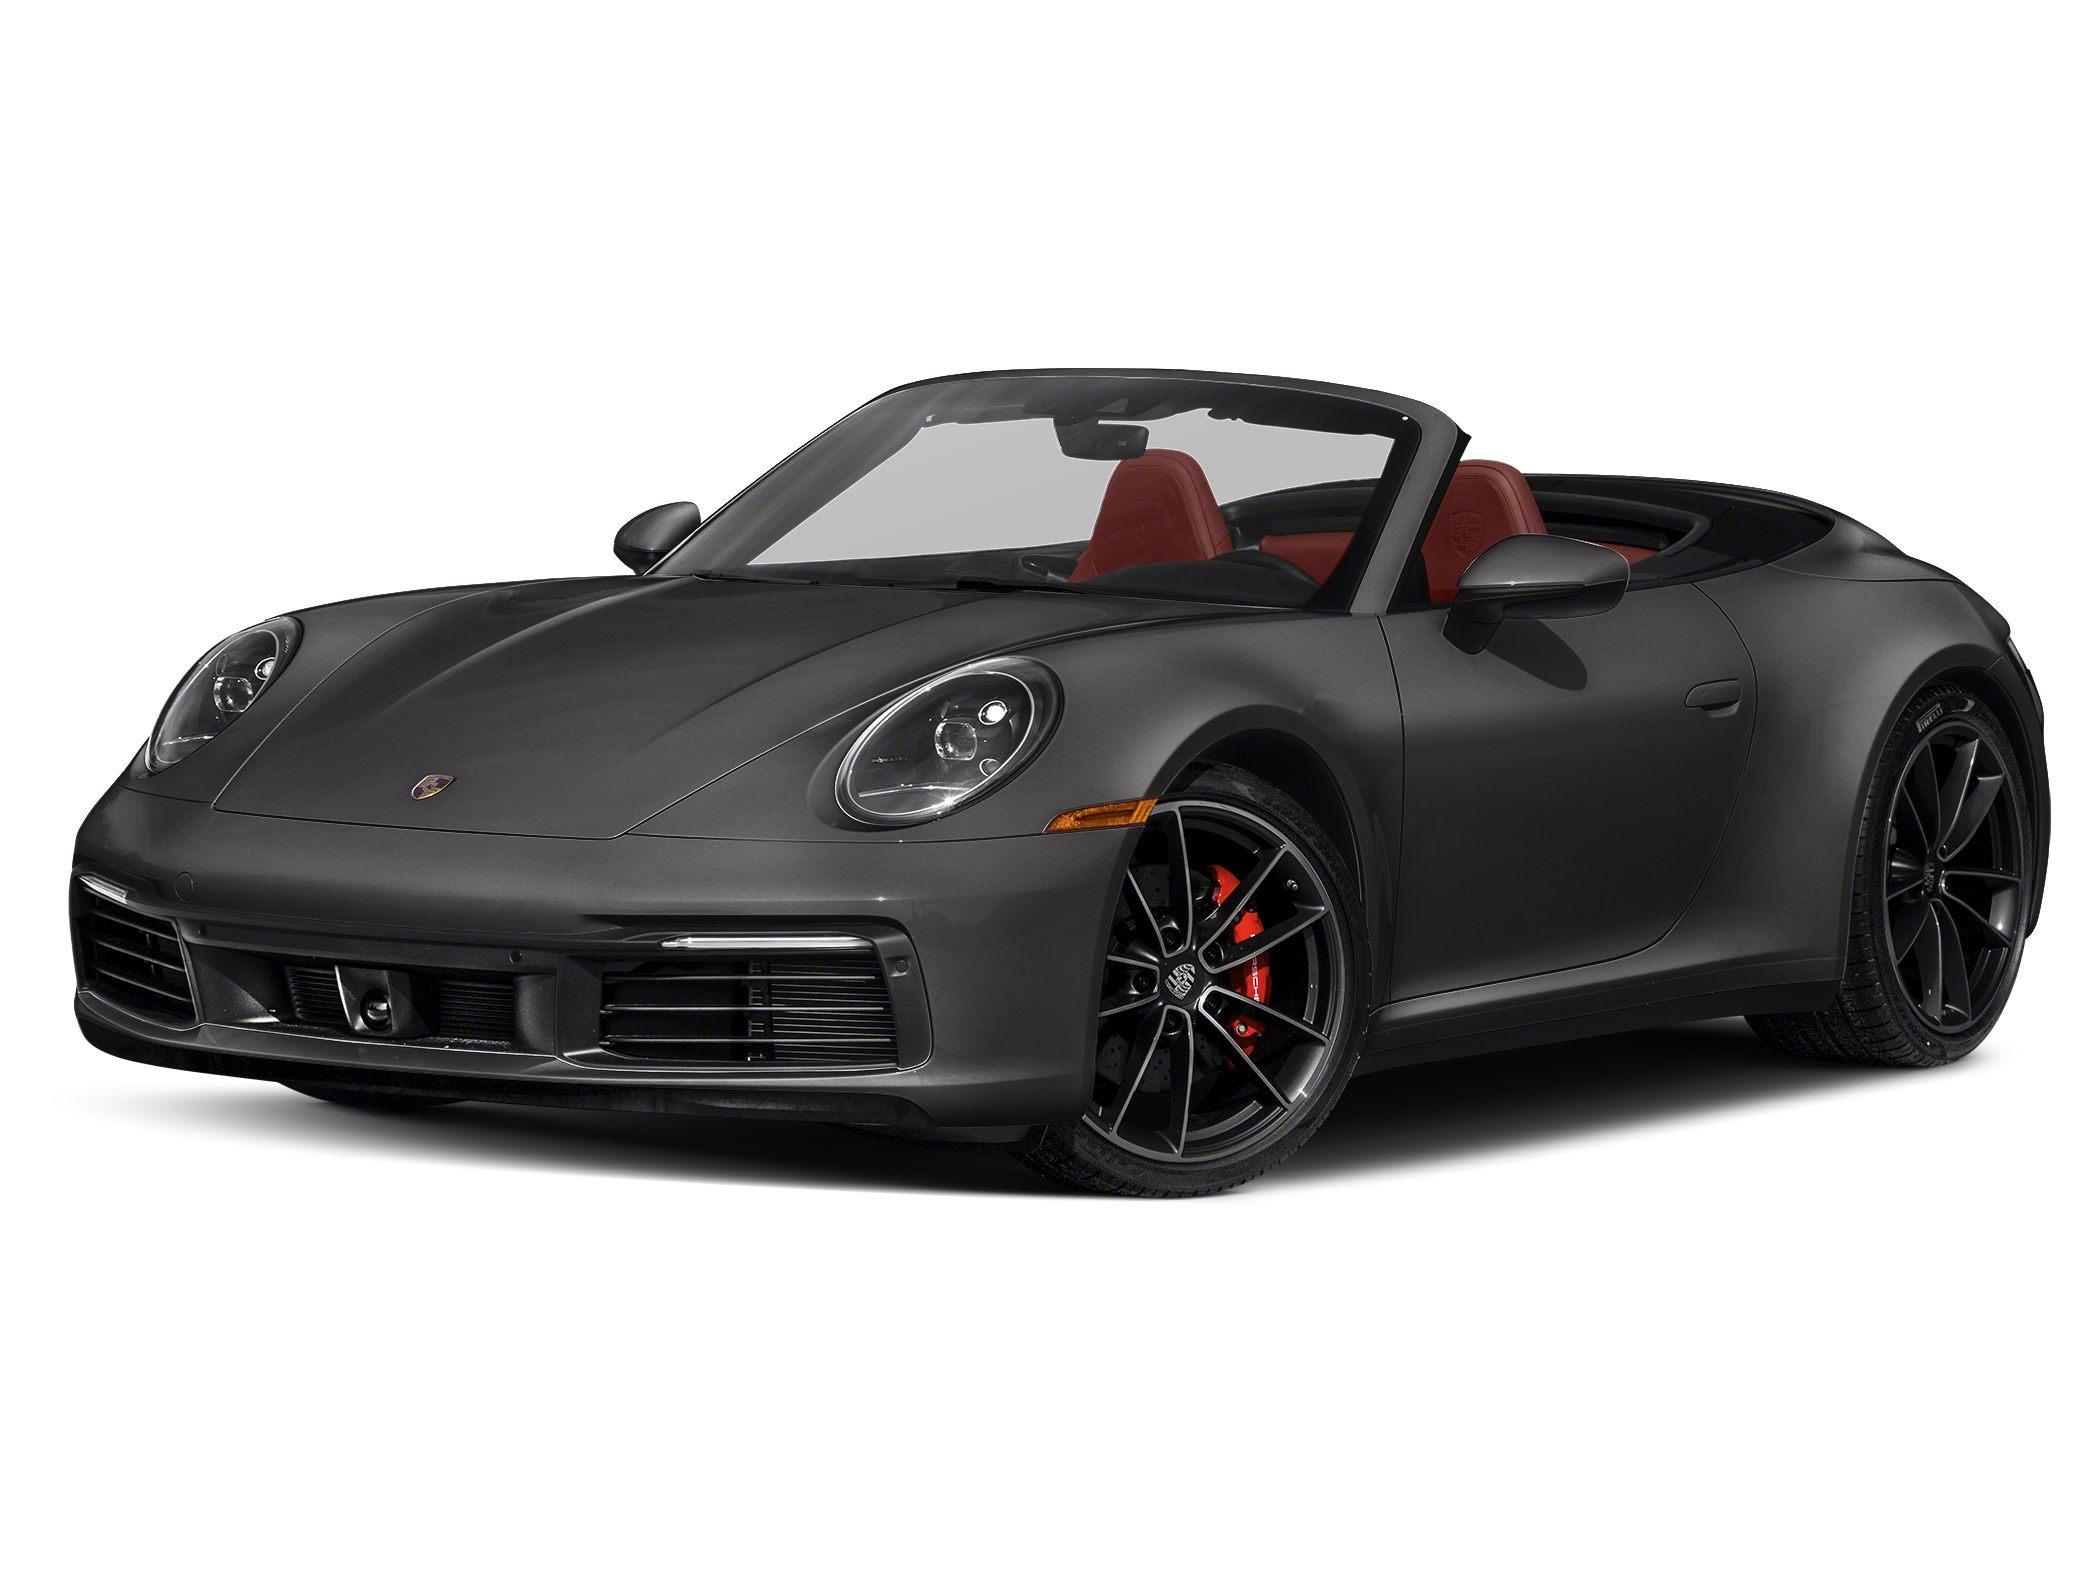 2021 Porsche 911 Carrera Cabriolet